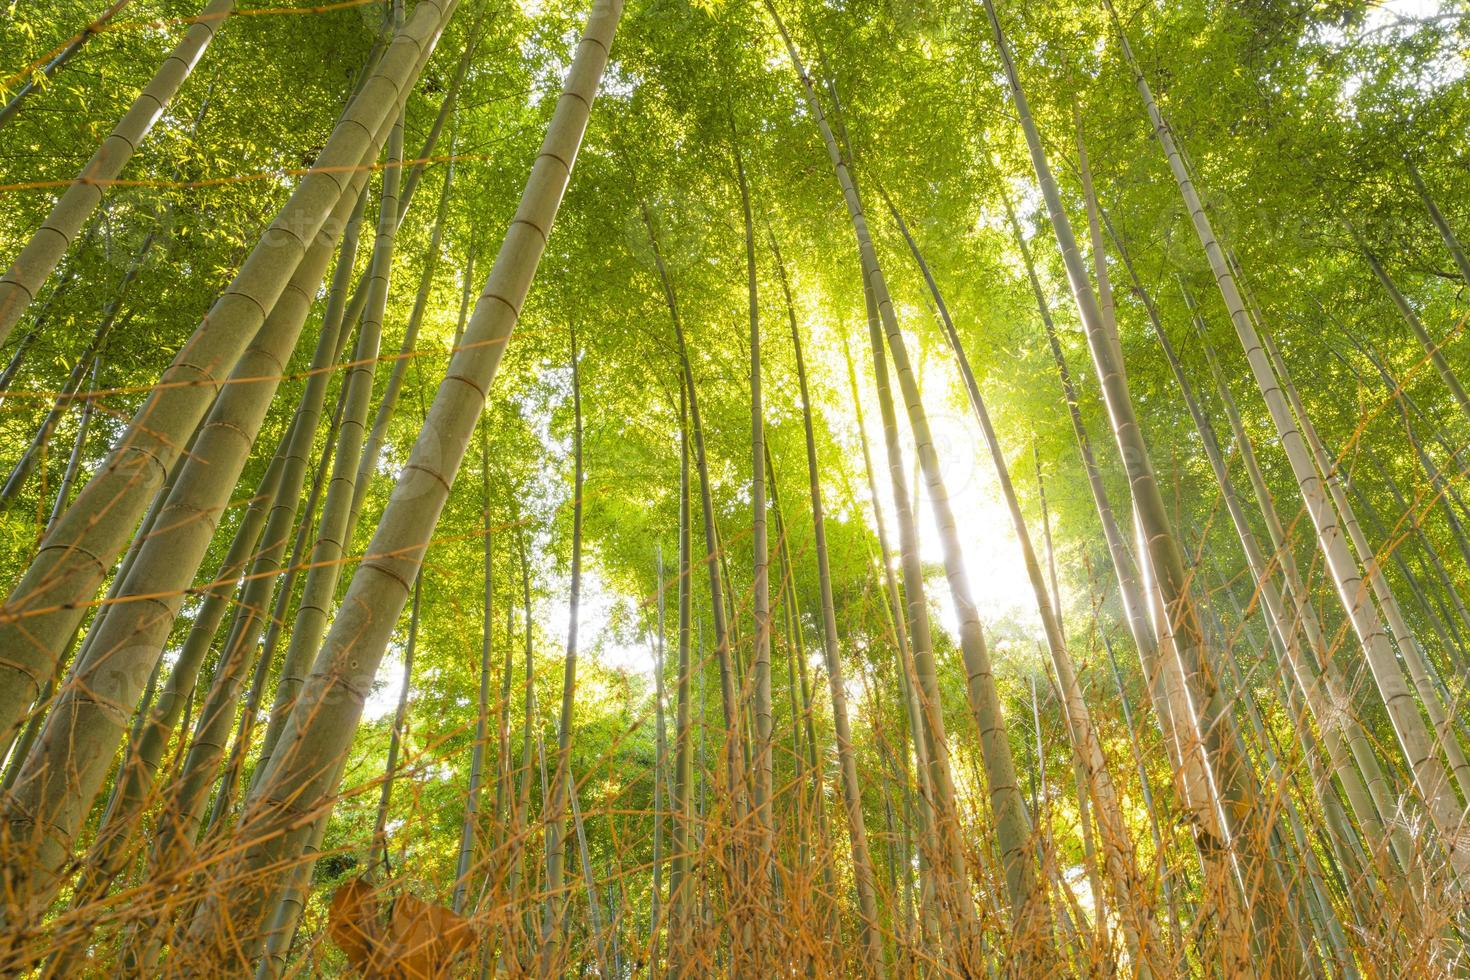 bambuskog, kyoto, japan foto